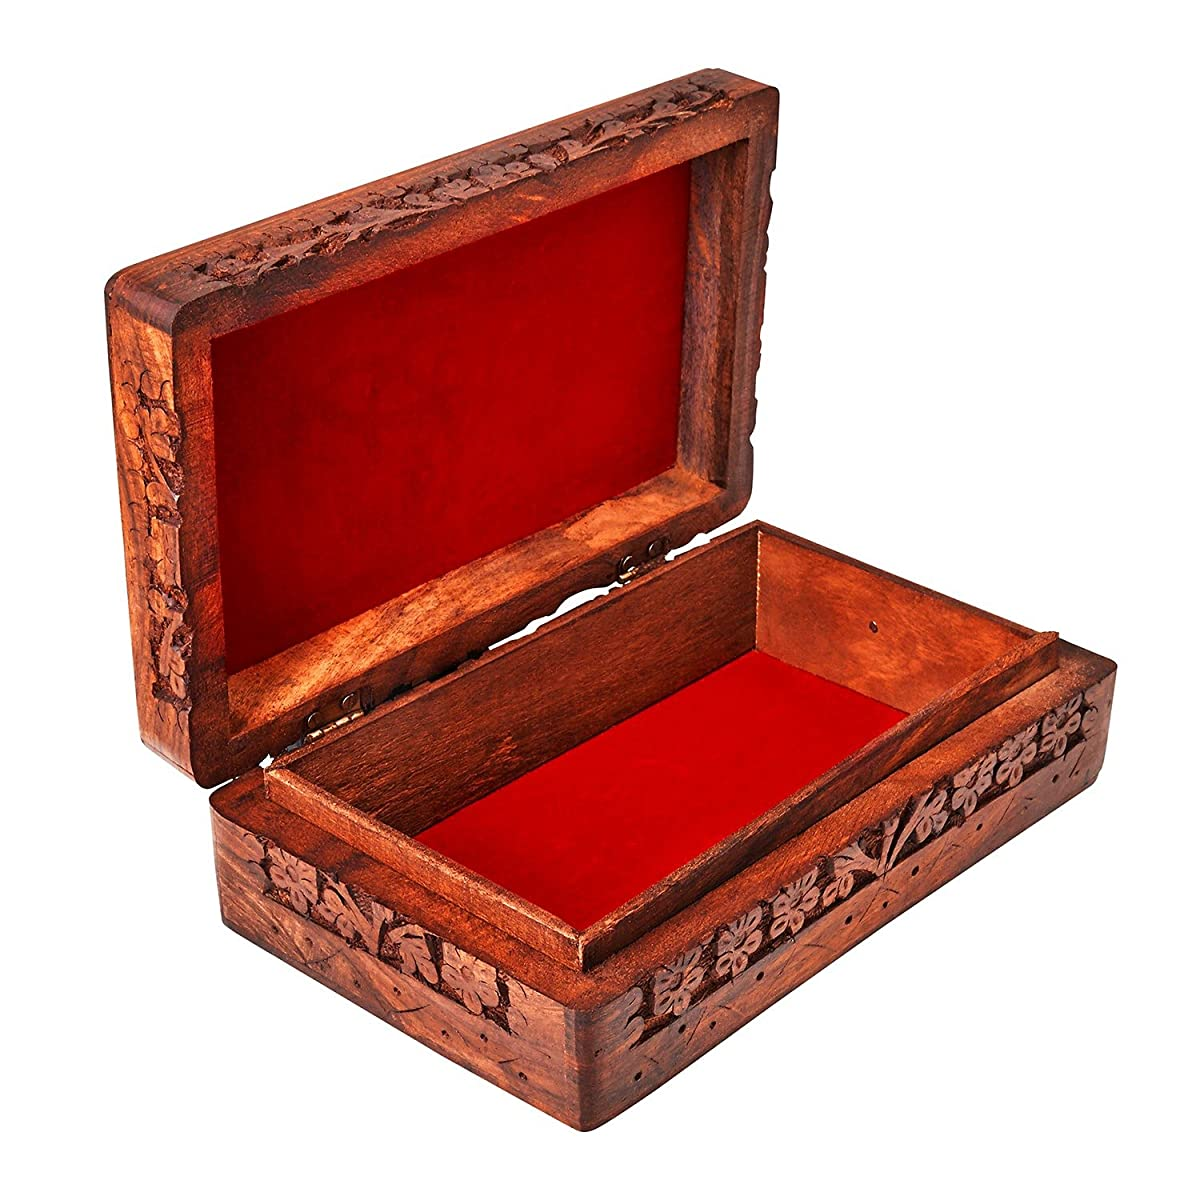 Handmade Decorative Wooden Jewelry Box Jewelry Organizer